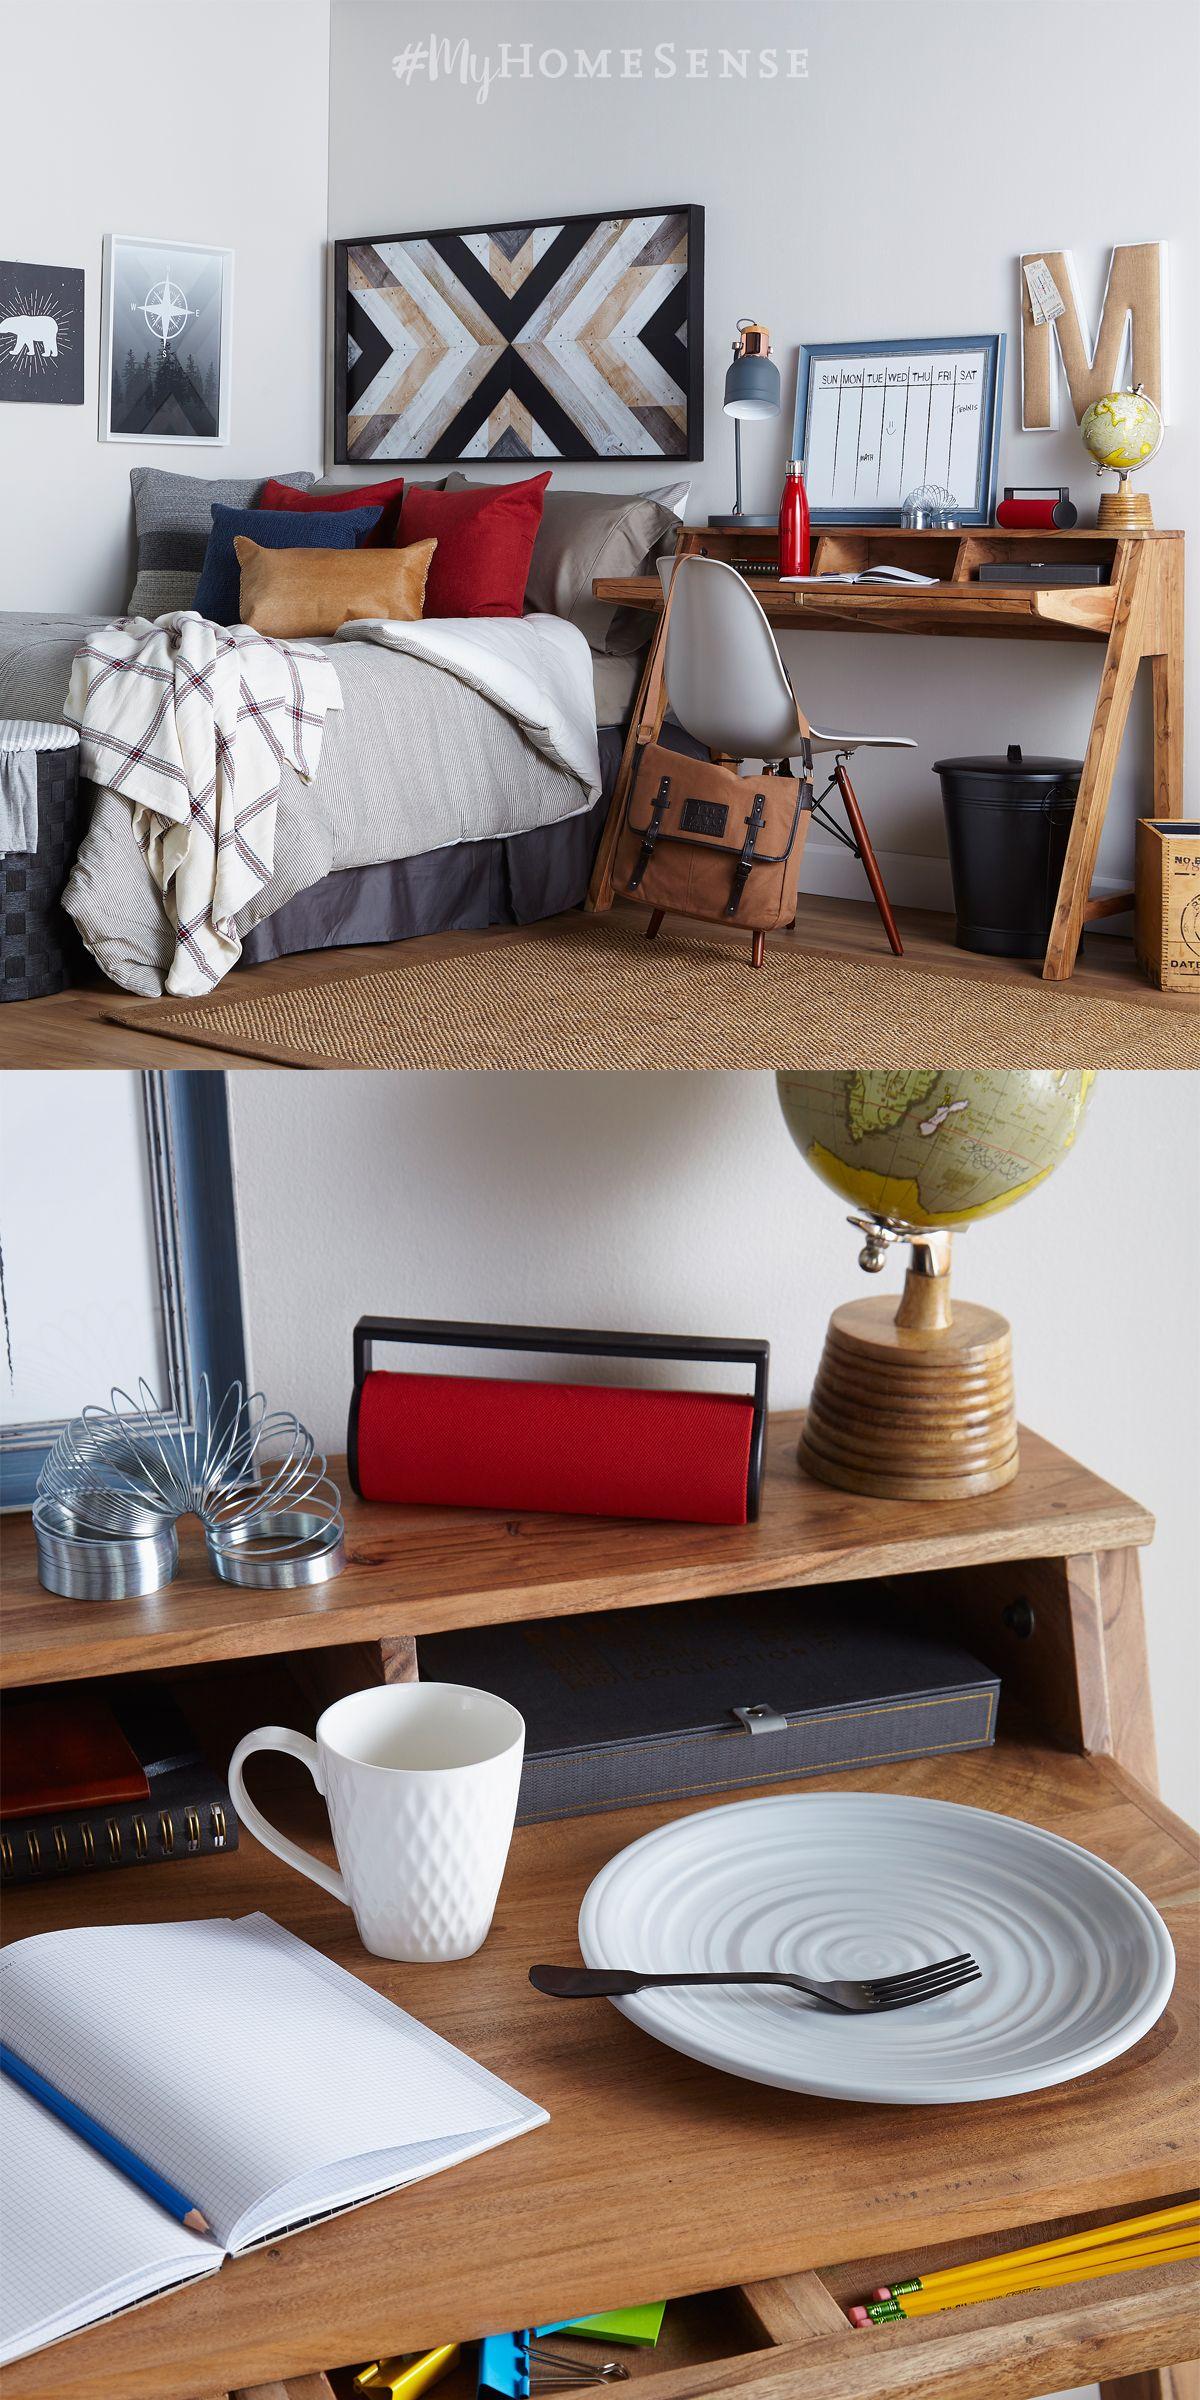 The Collegiate Cool Lookbook Dorm Room Styles Dorm Room Decor Dorm Room Essentials